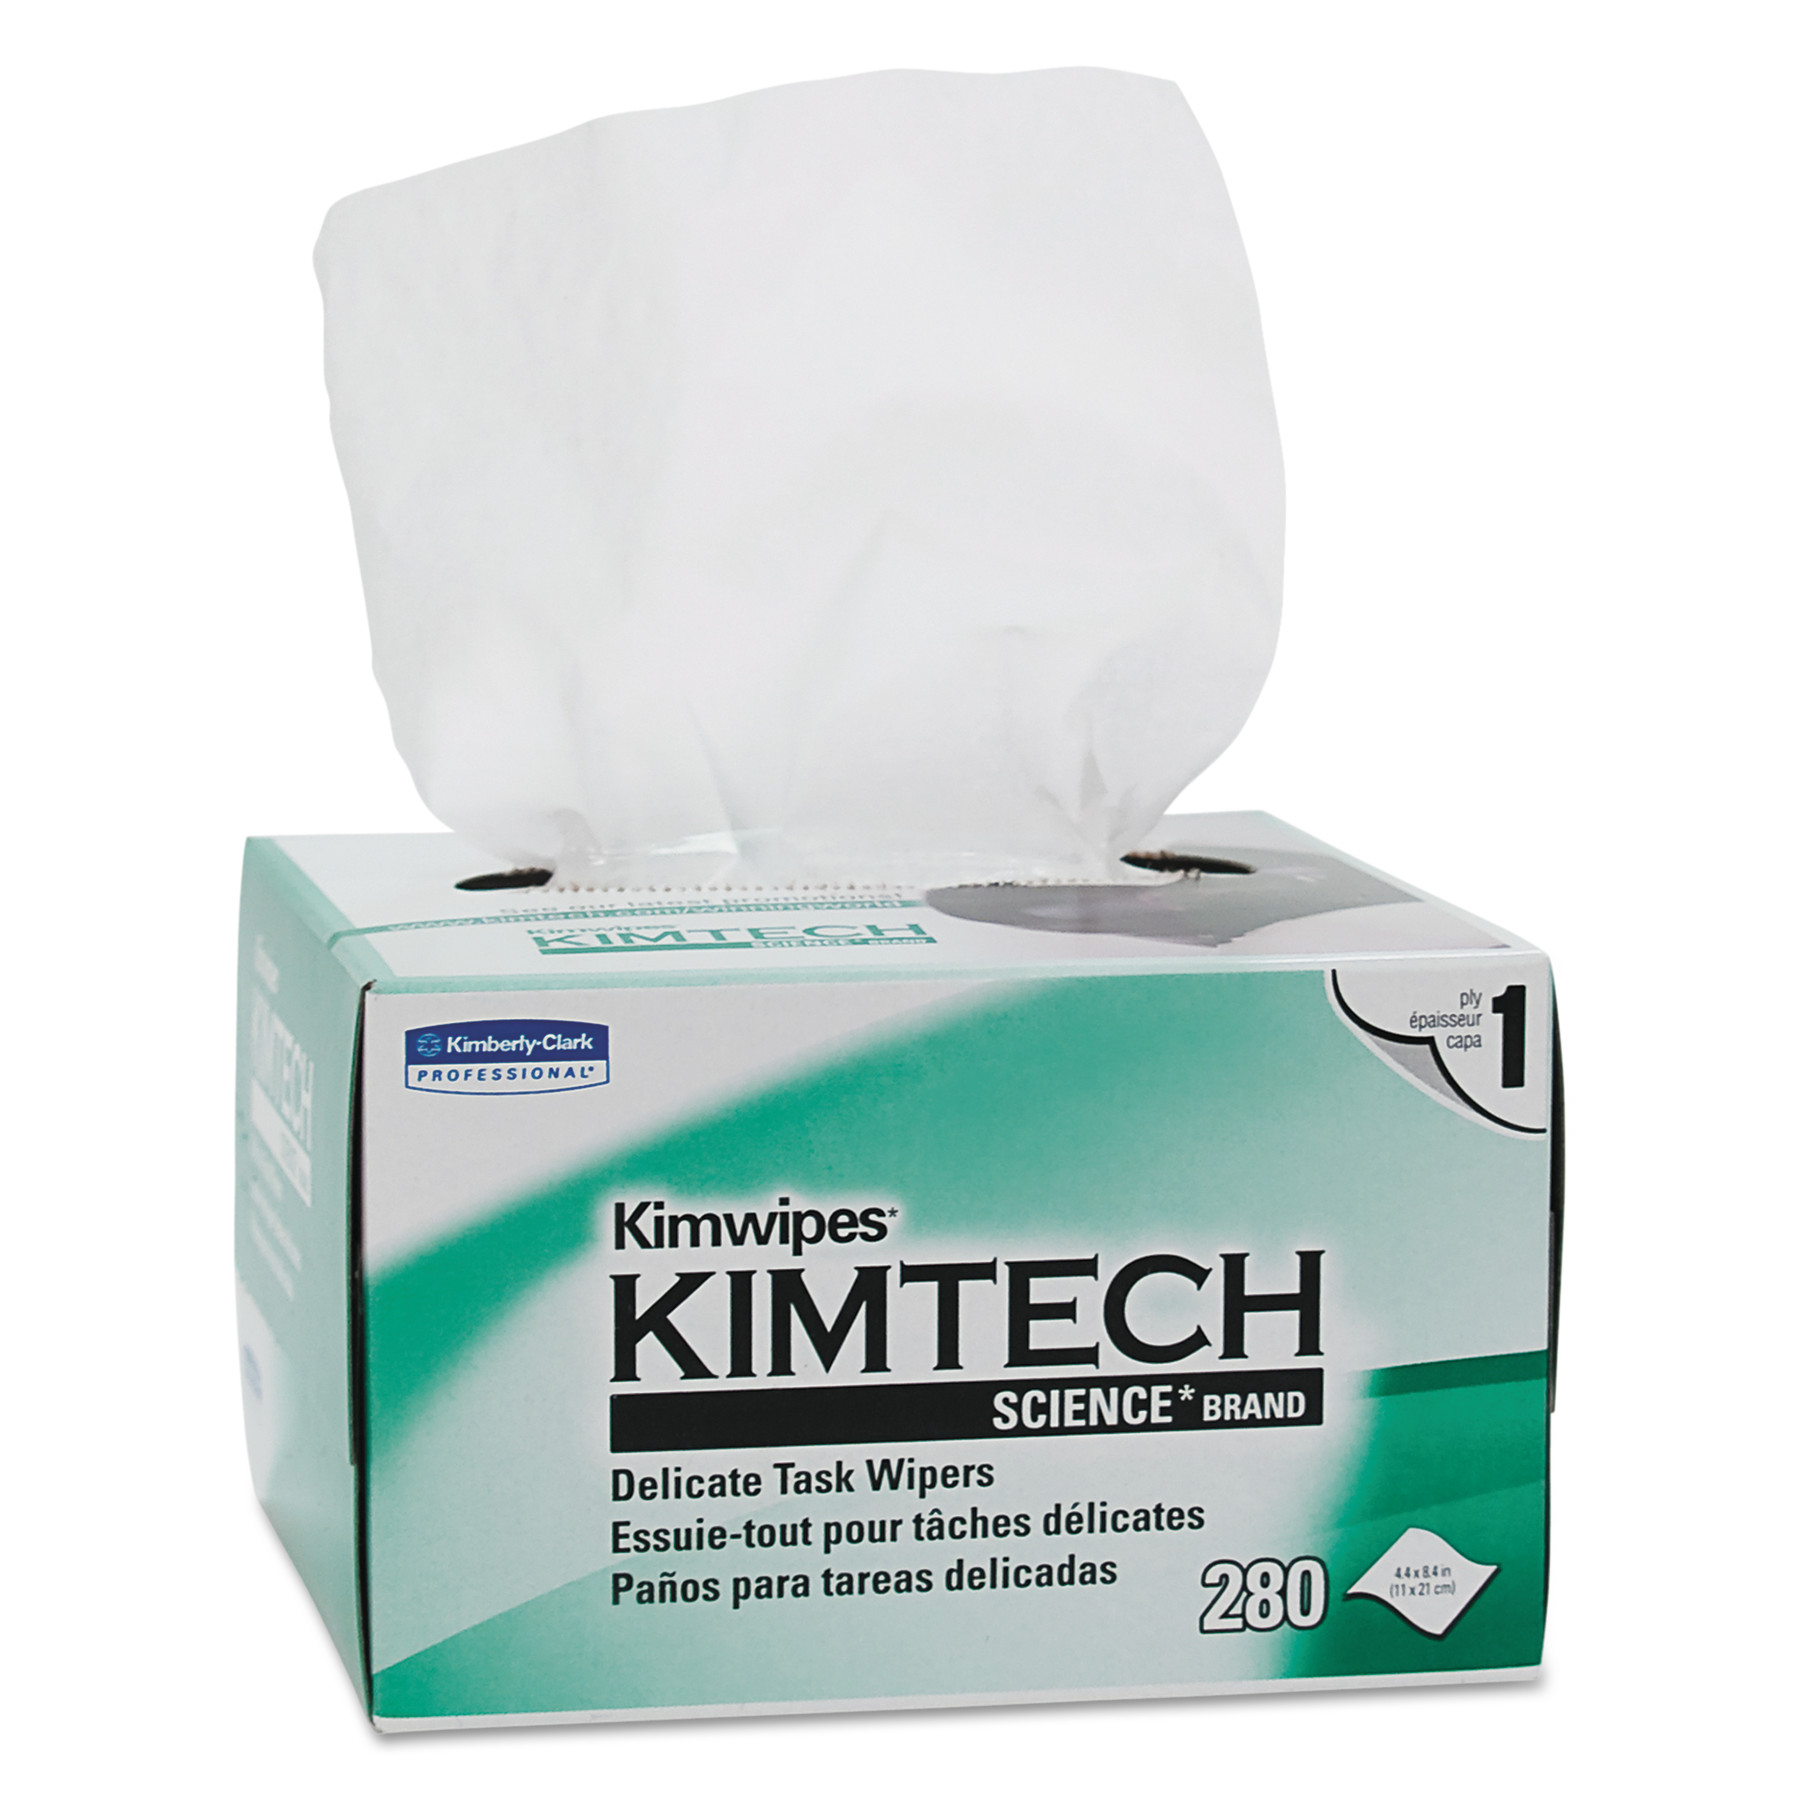 Kimtech* KIMWIPES, Delicate Task Wipers, 1-Ply, 4 2/5 x 8 2/5, 280/Box